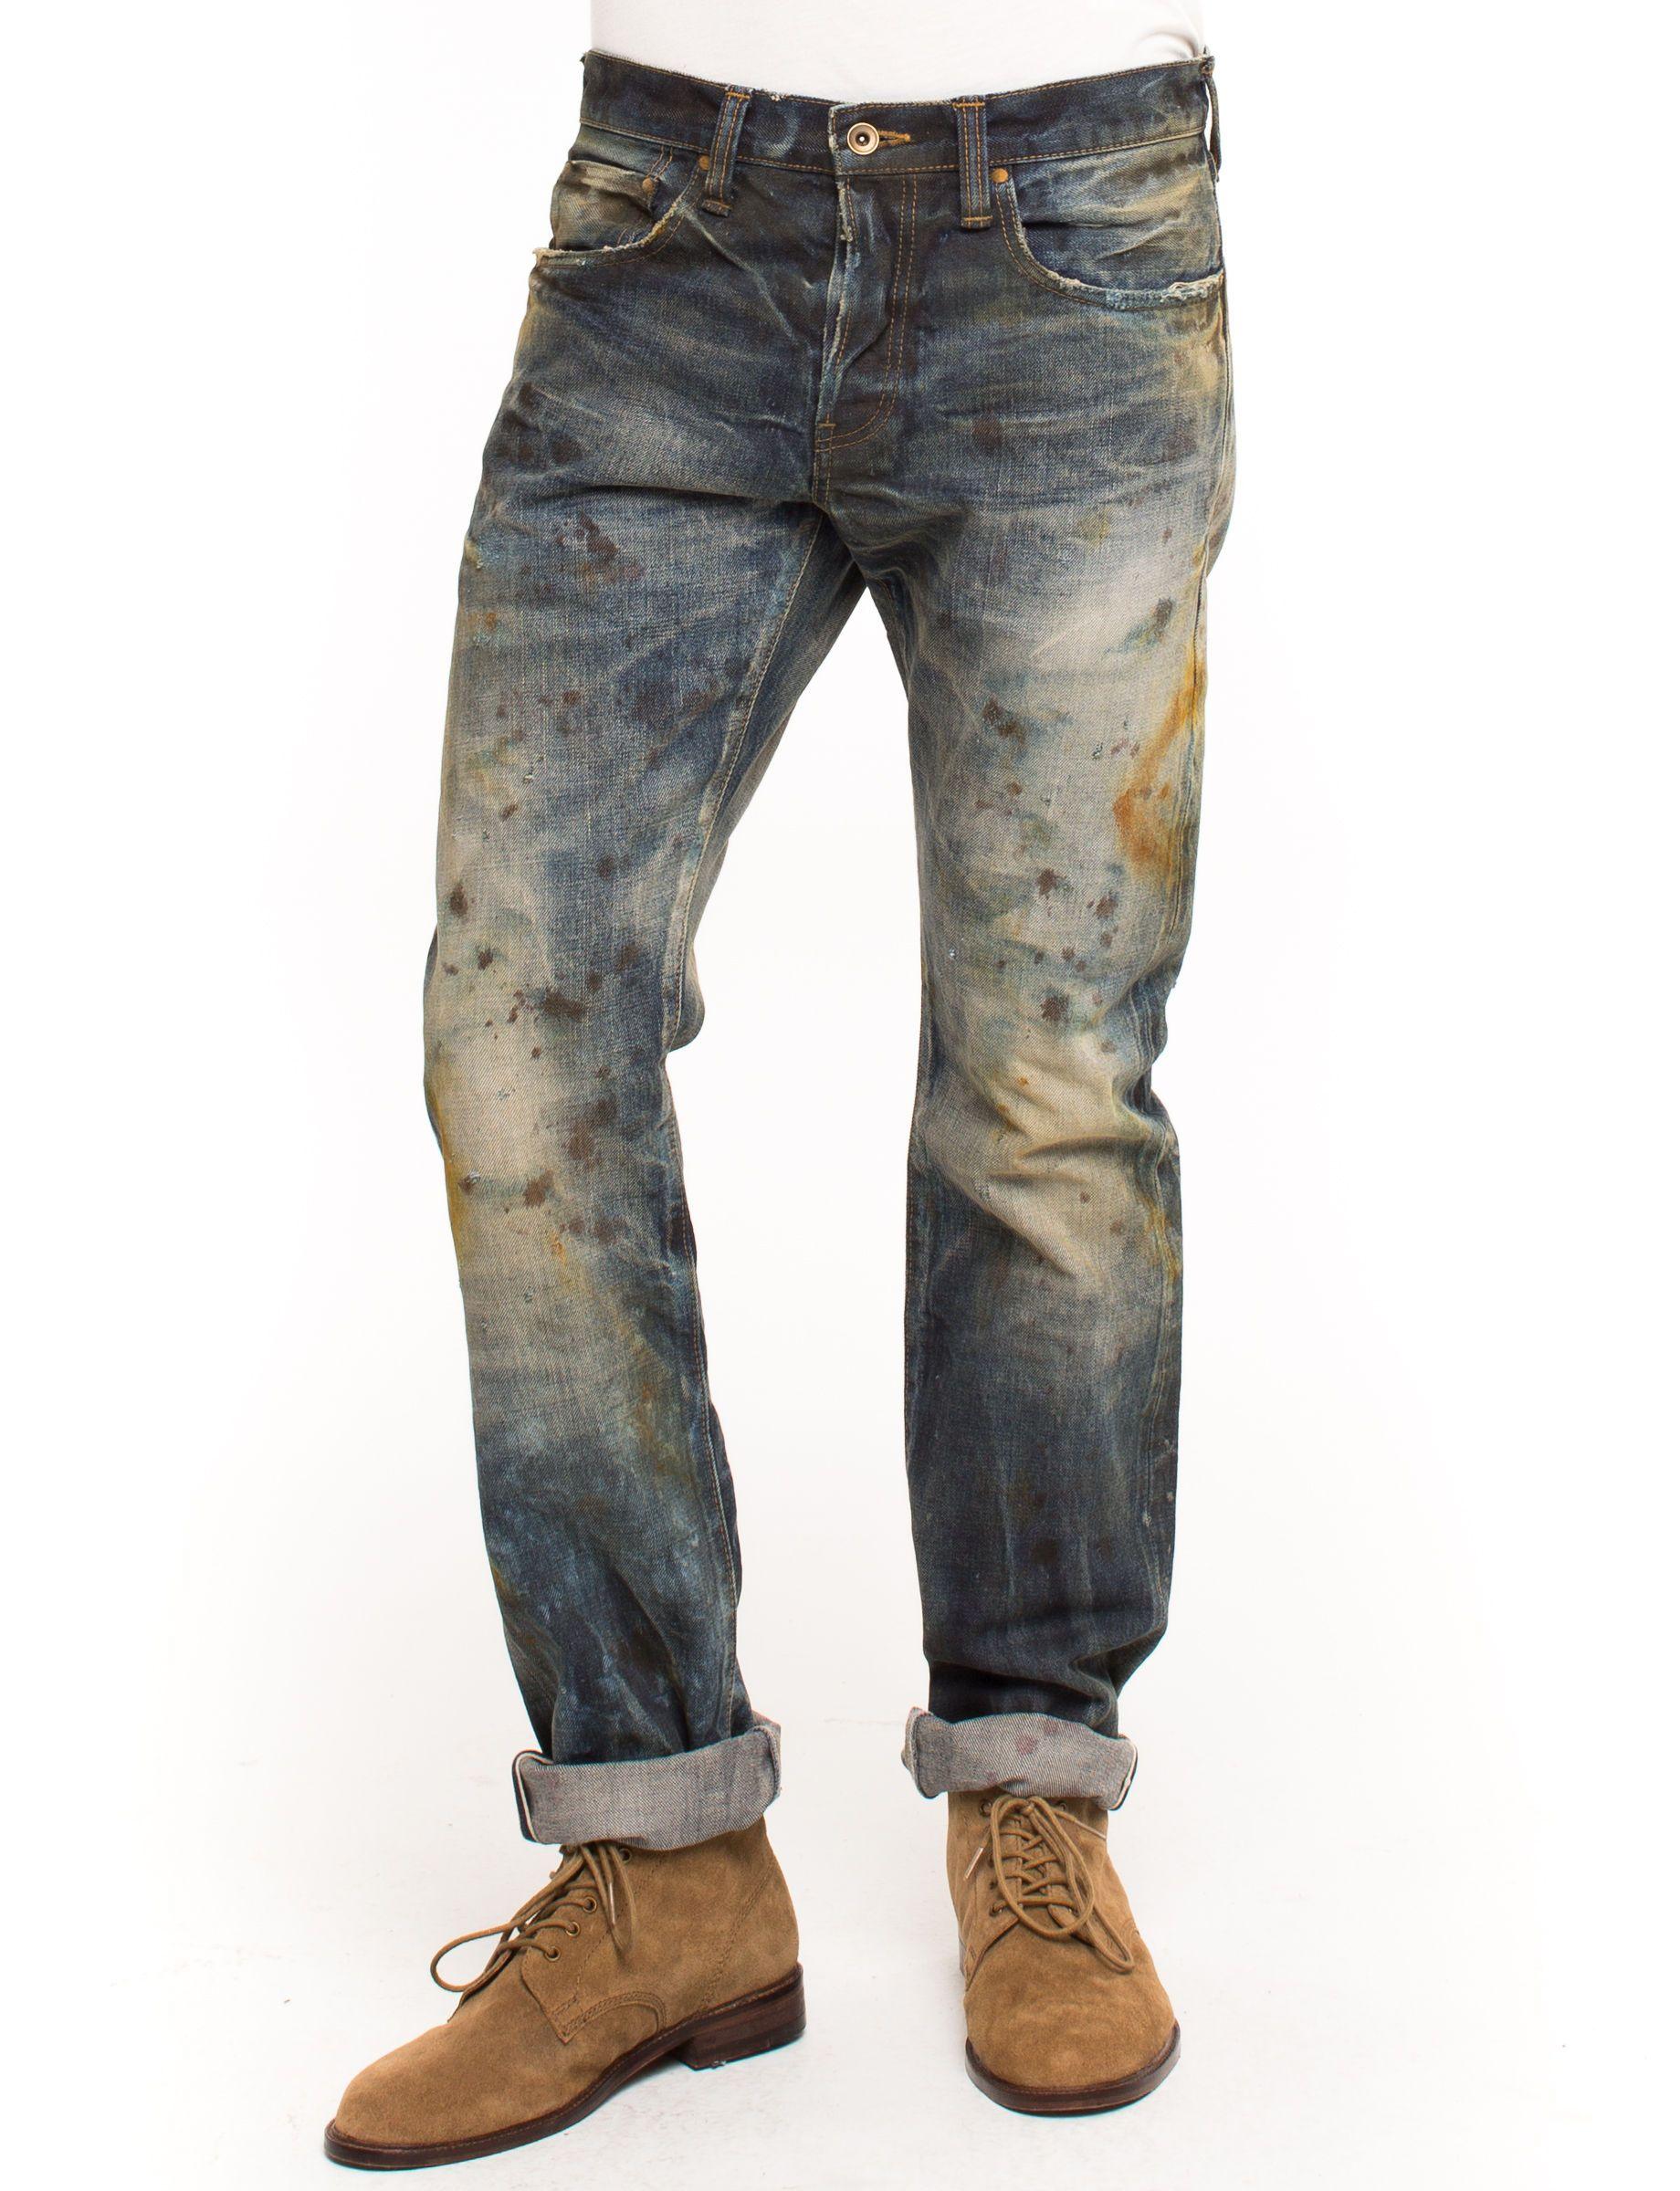 Explore Fashionable Sale Online DENIM - Denim trousers Prps rGI9aV8I